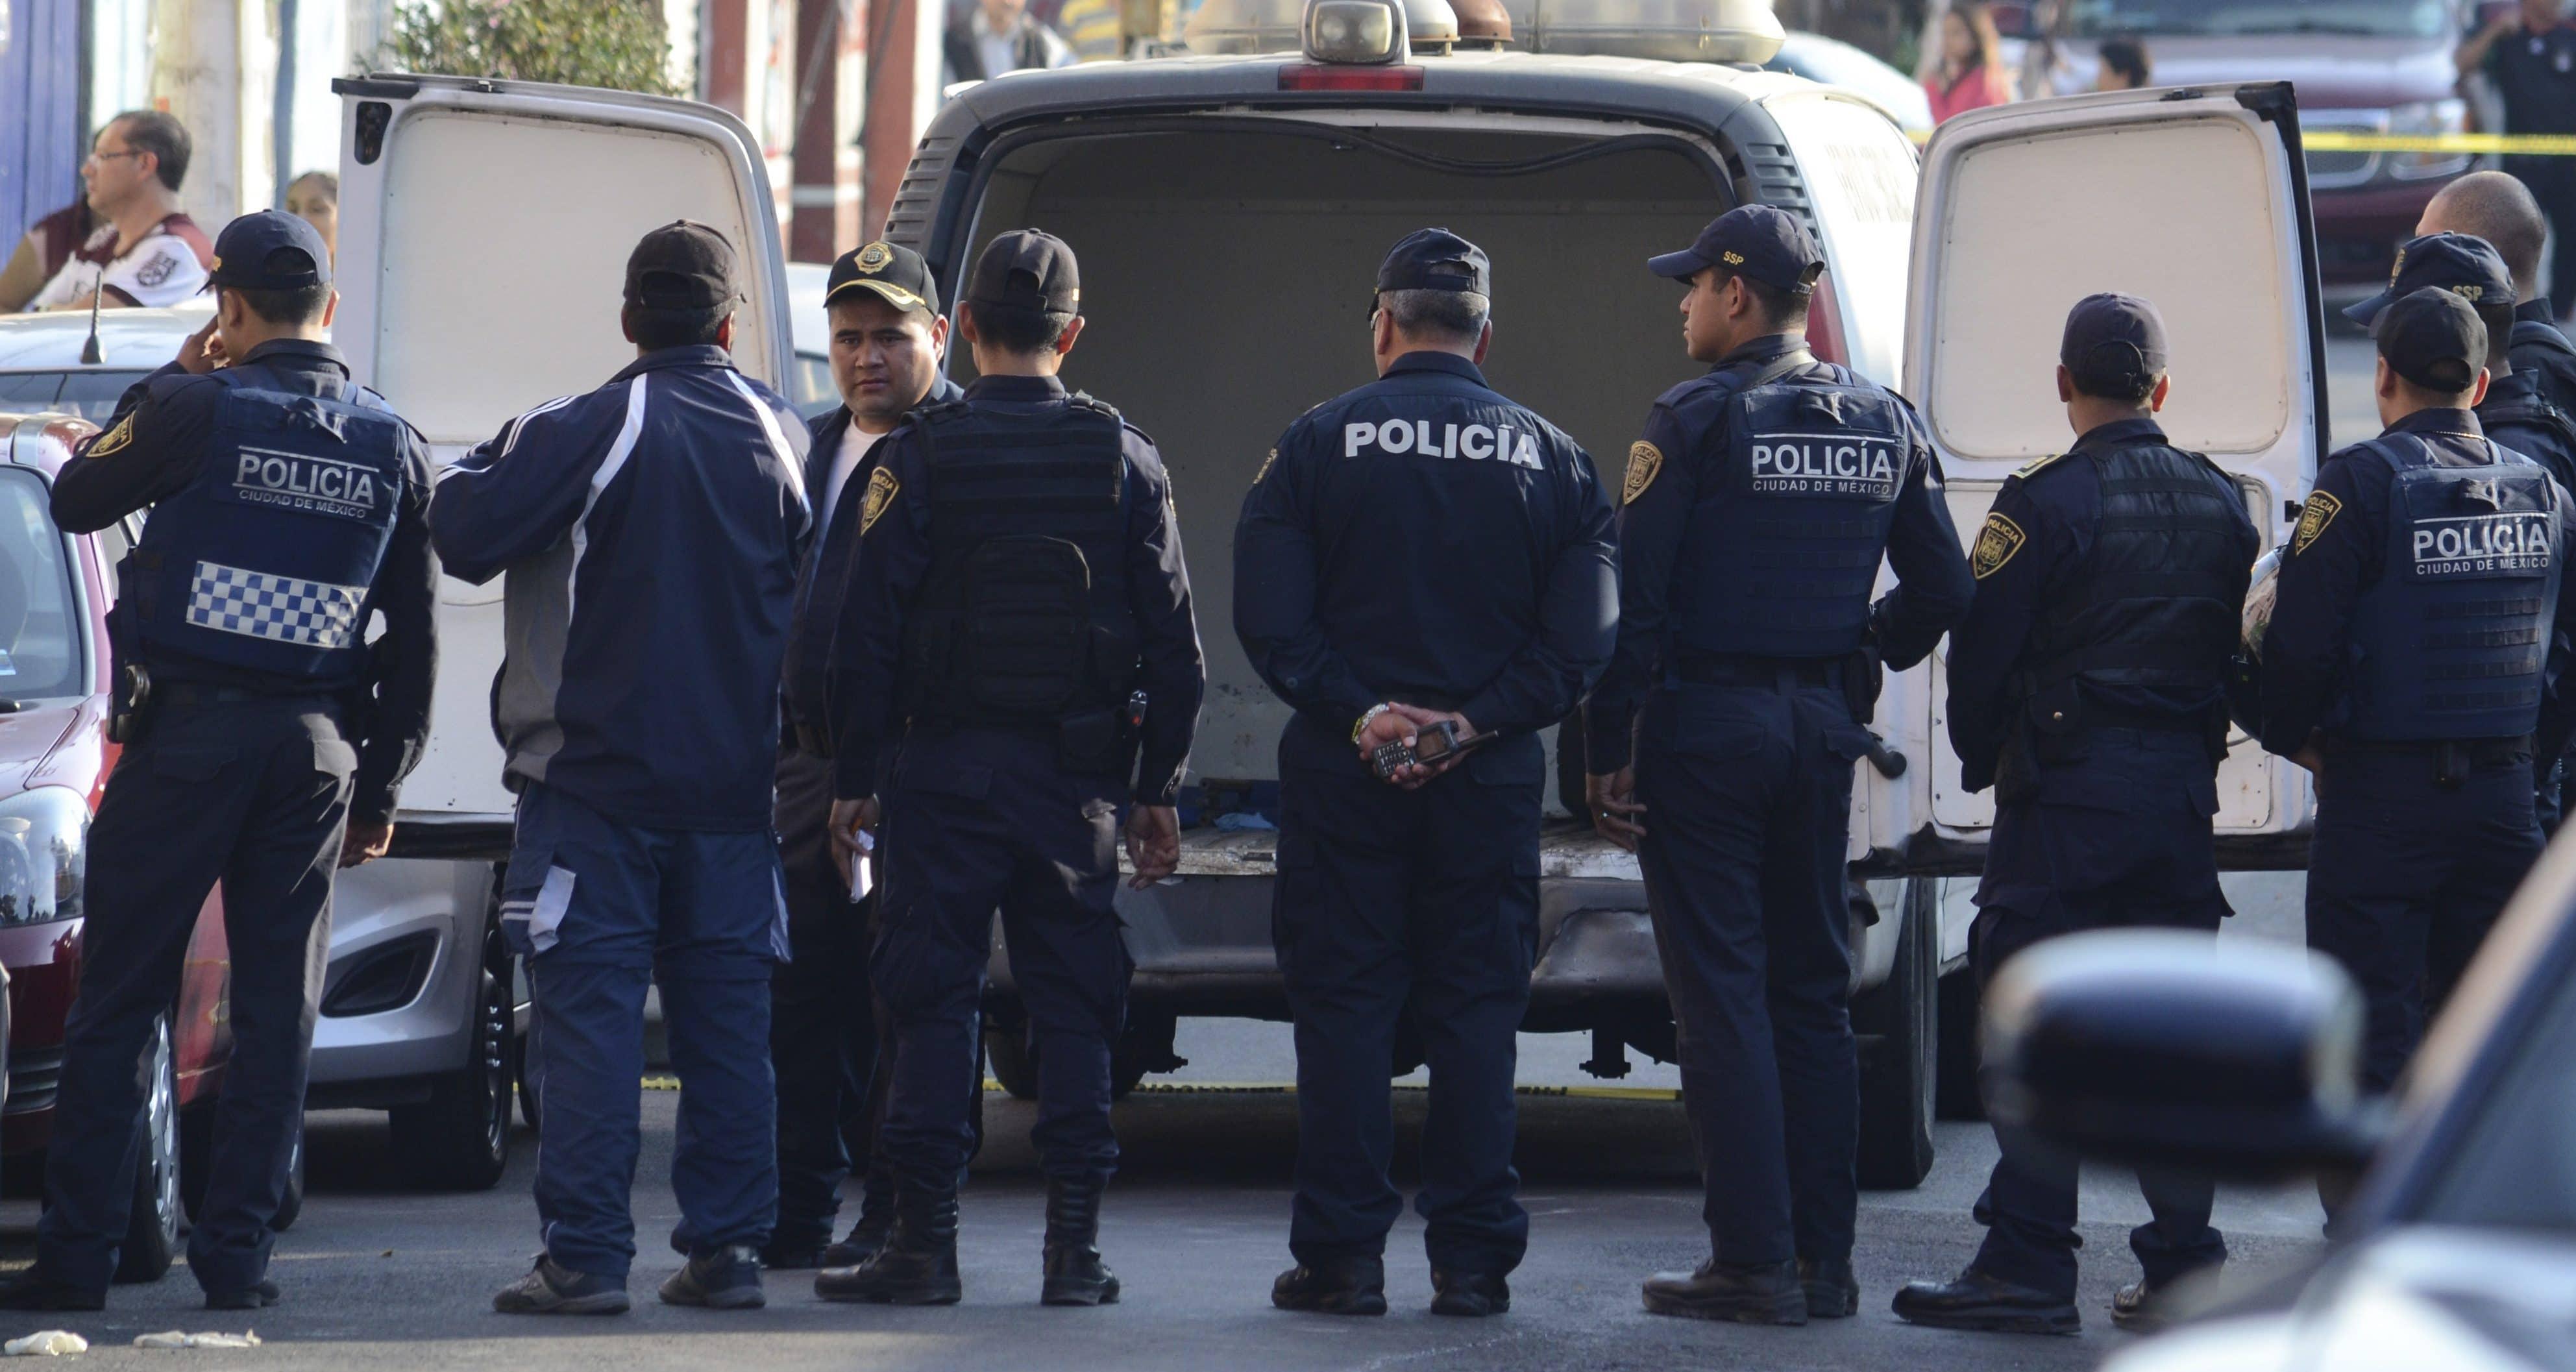 Requisitos para ser policia judicial en Mexico